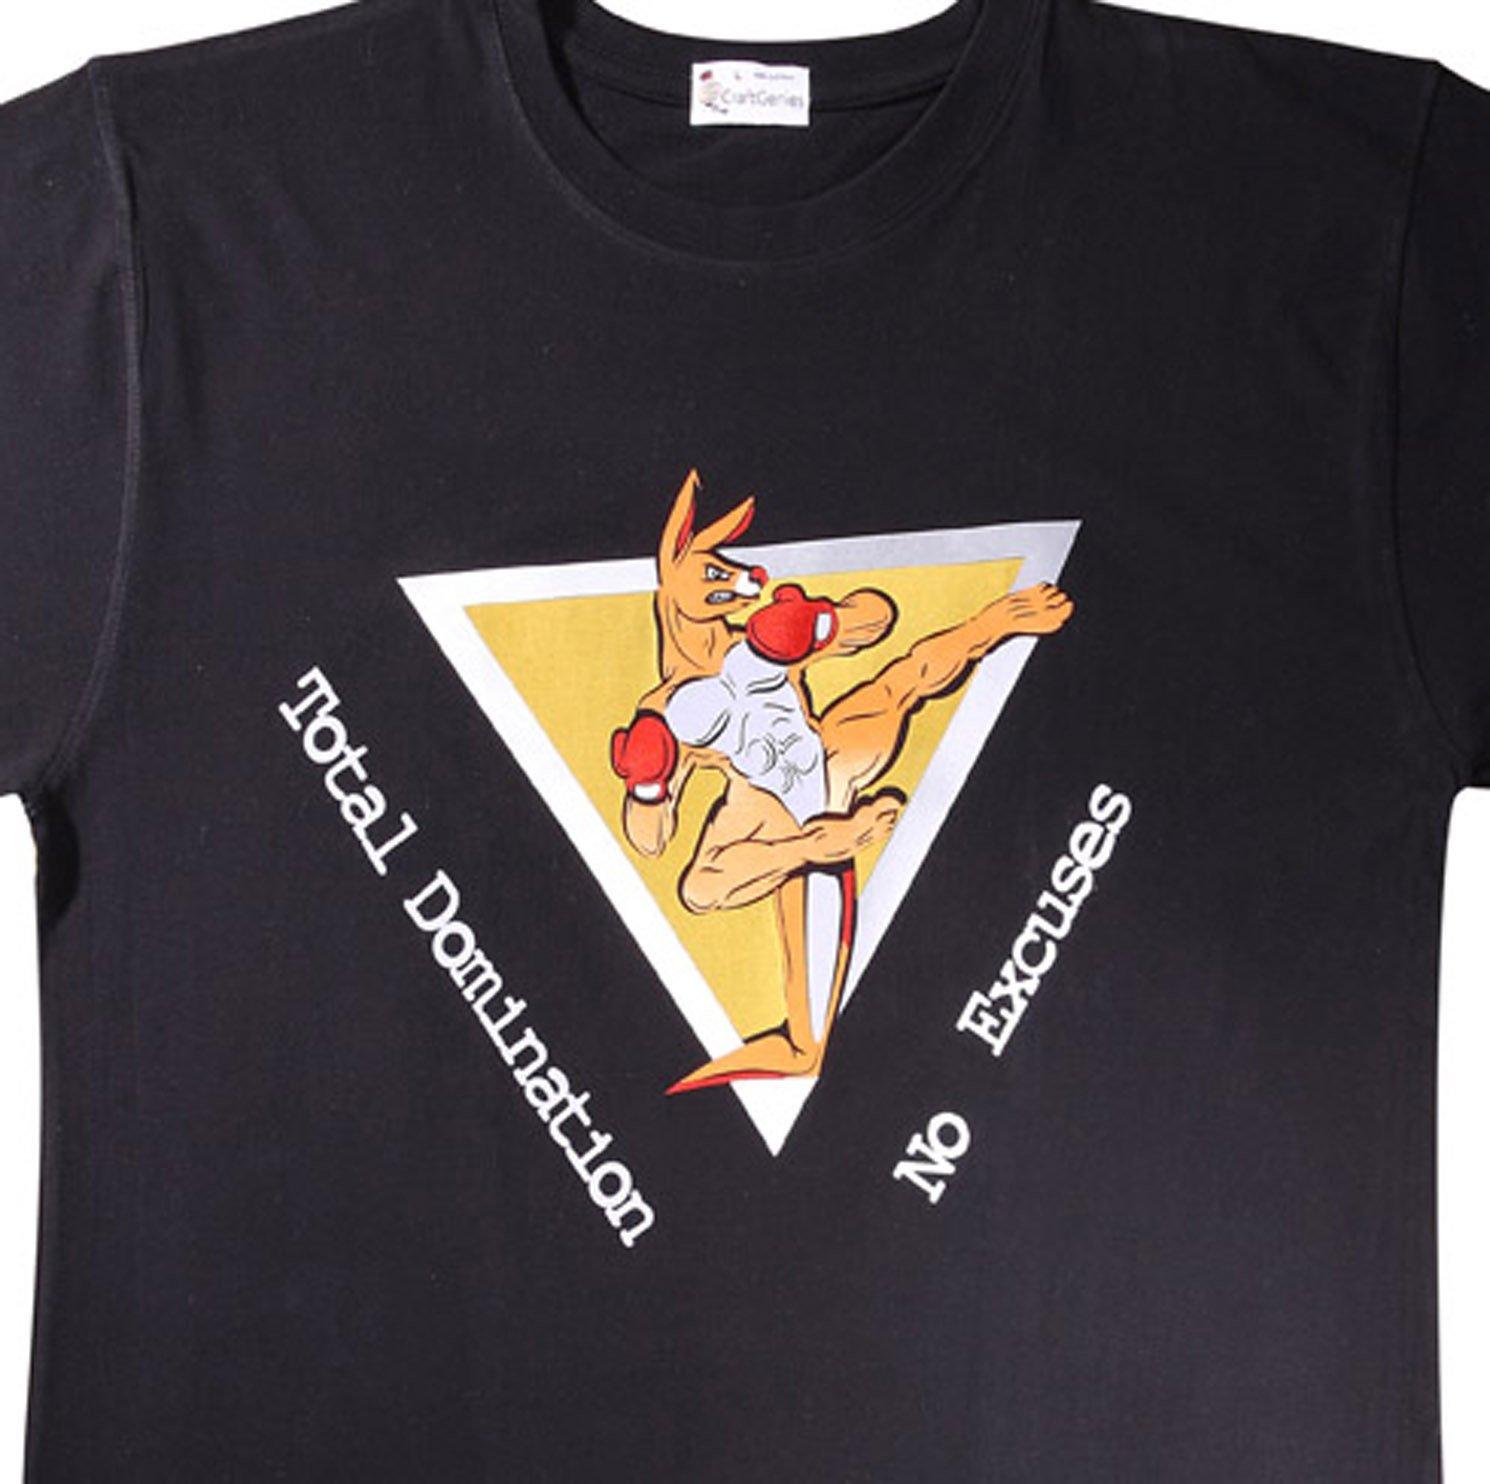 Kangaroo T Shirt - Australian Shirt for Men, New Shirt    (Men's XL)